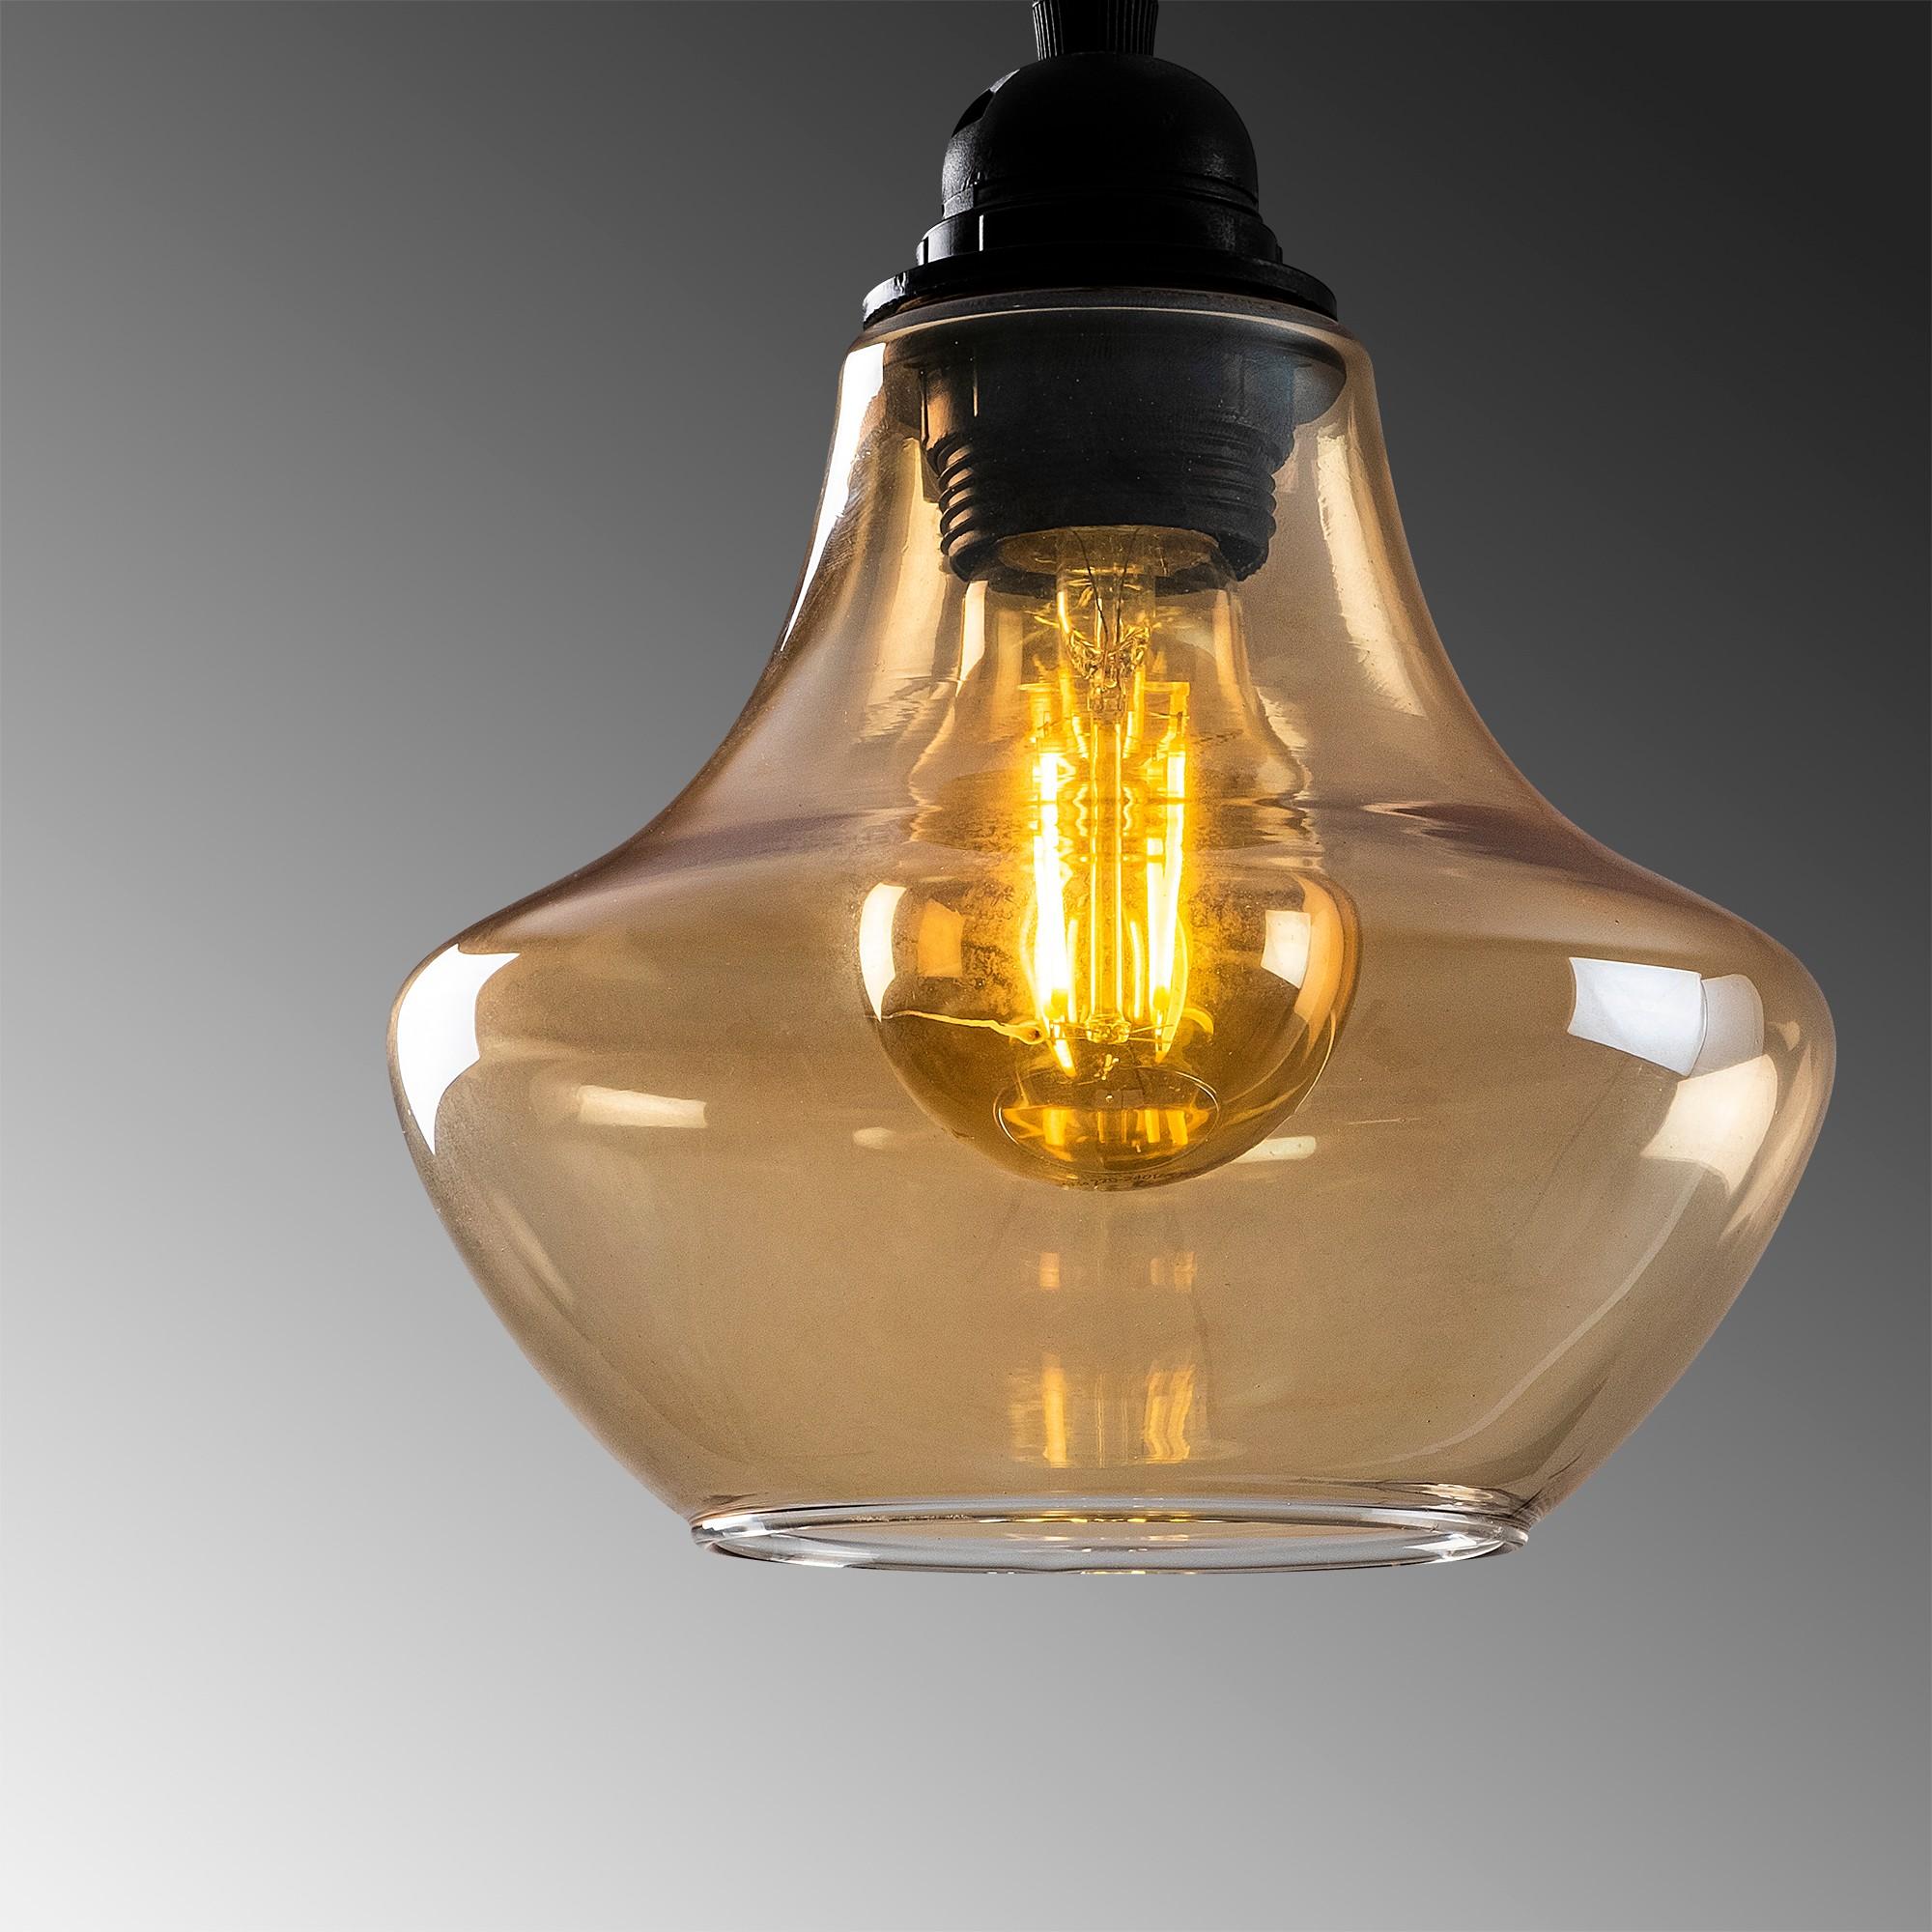 gouden hanglamp e27 fitting-Moroni - closeup